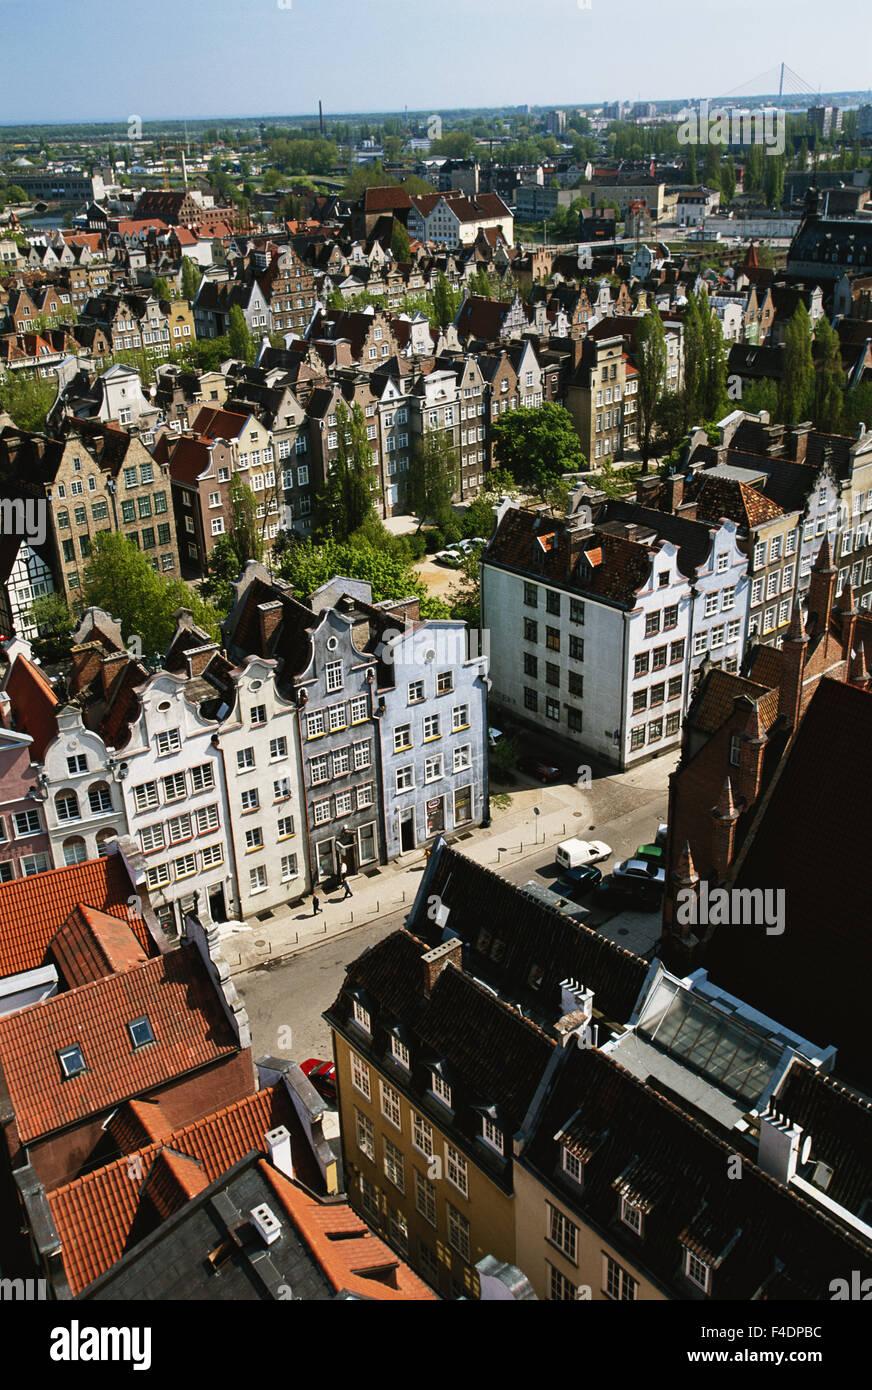 Poland, Pomerania, Gdansk. St. Mary's Basilica and houses. (Large format sizes available) - Stock Image